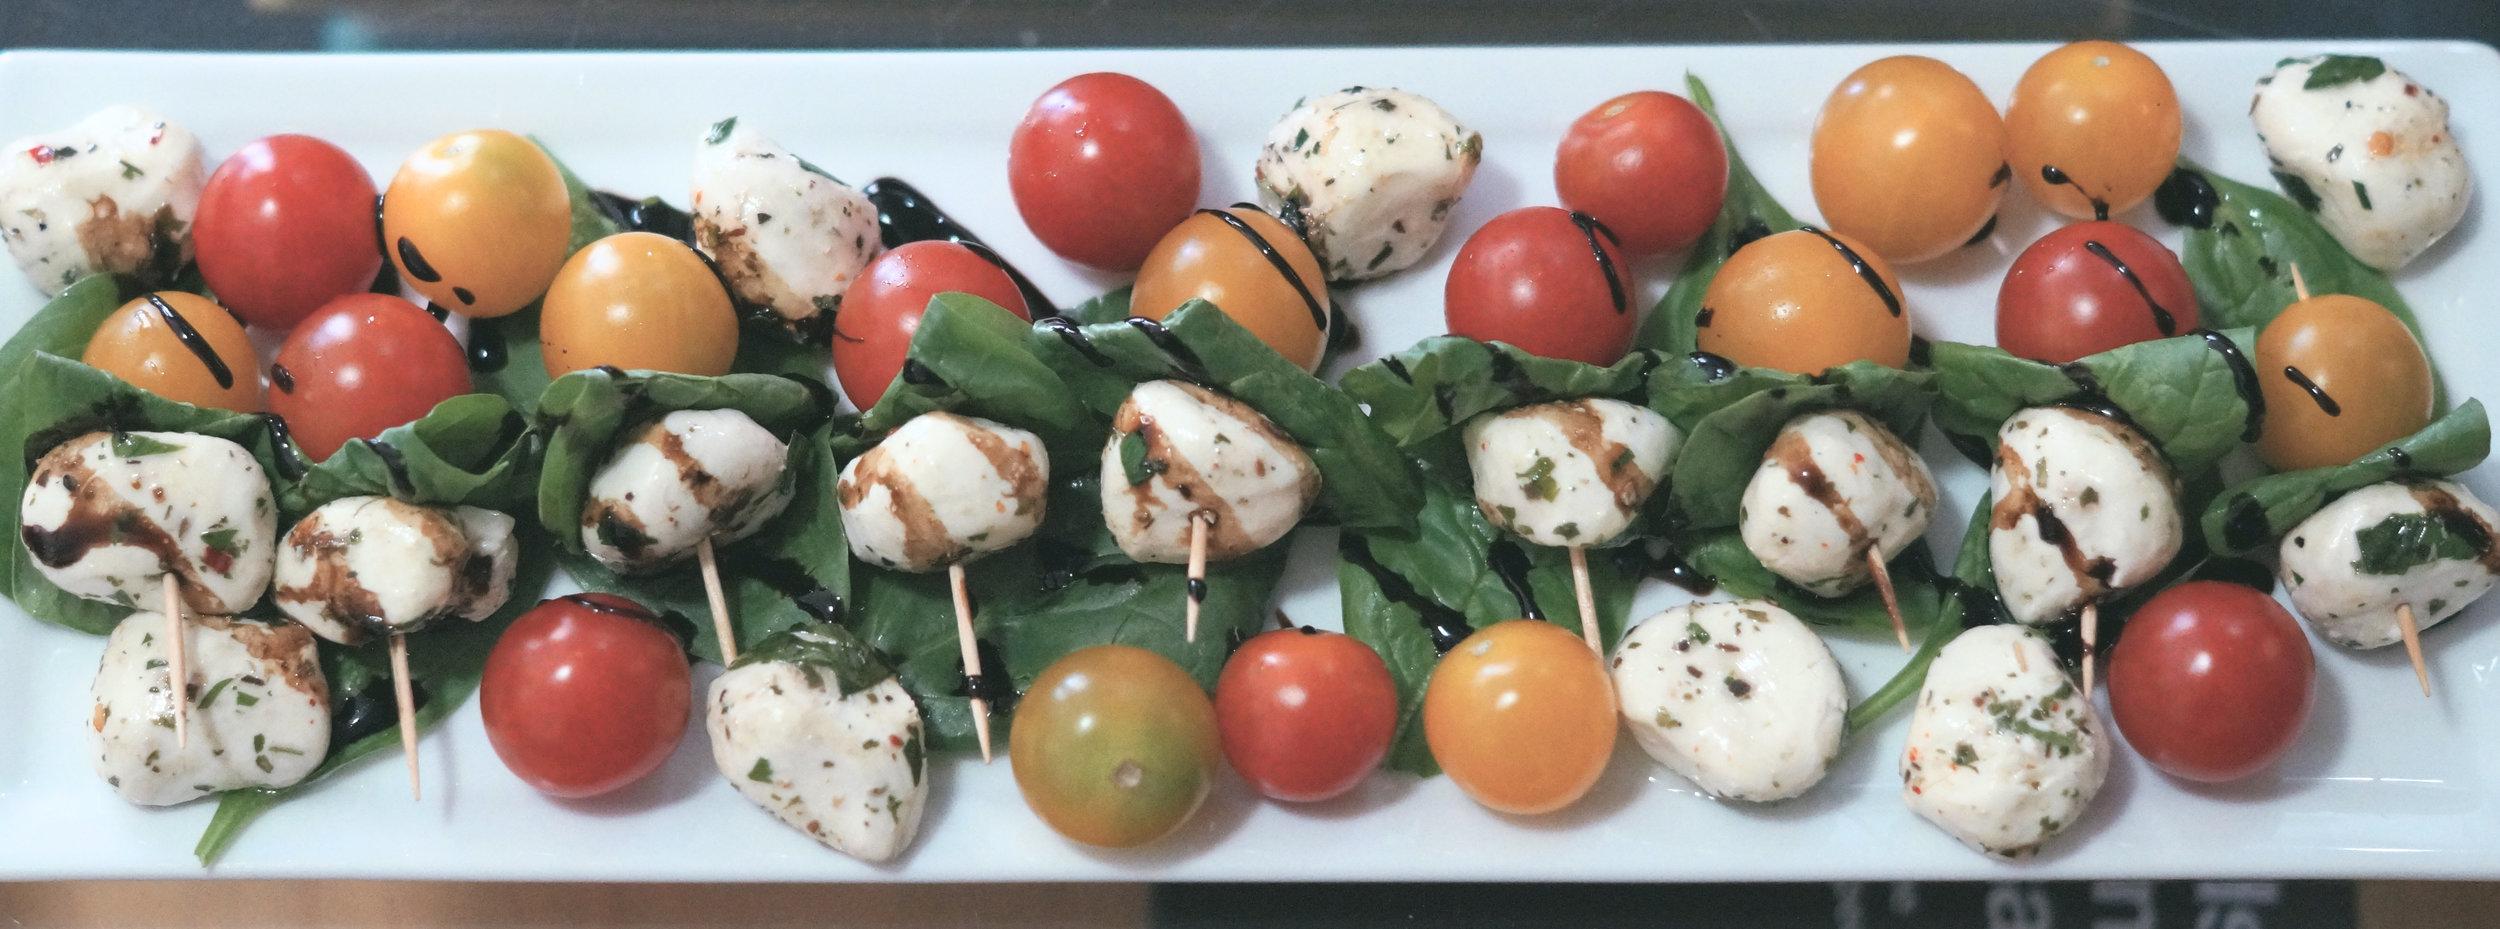 cherry tomatoes with mozzarella balls